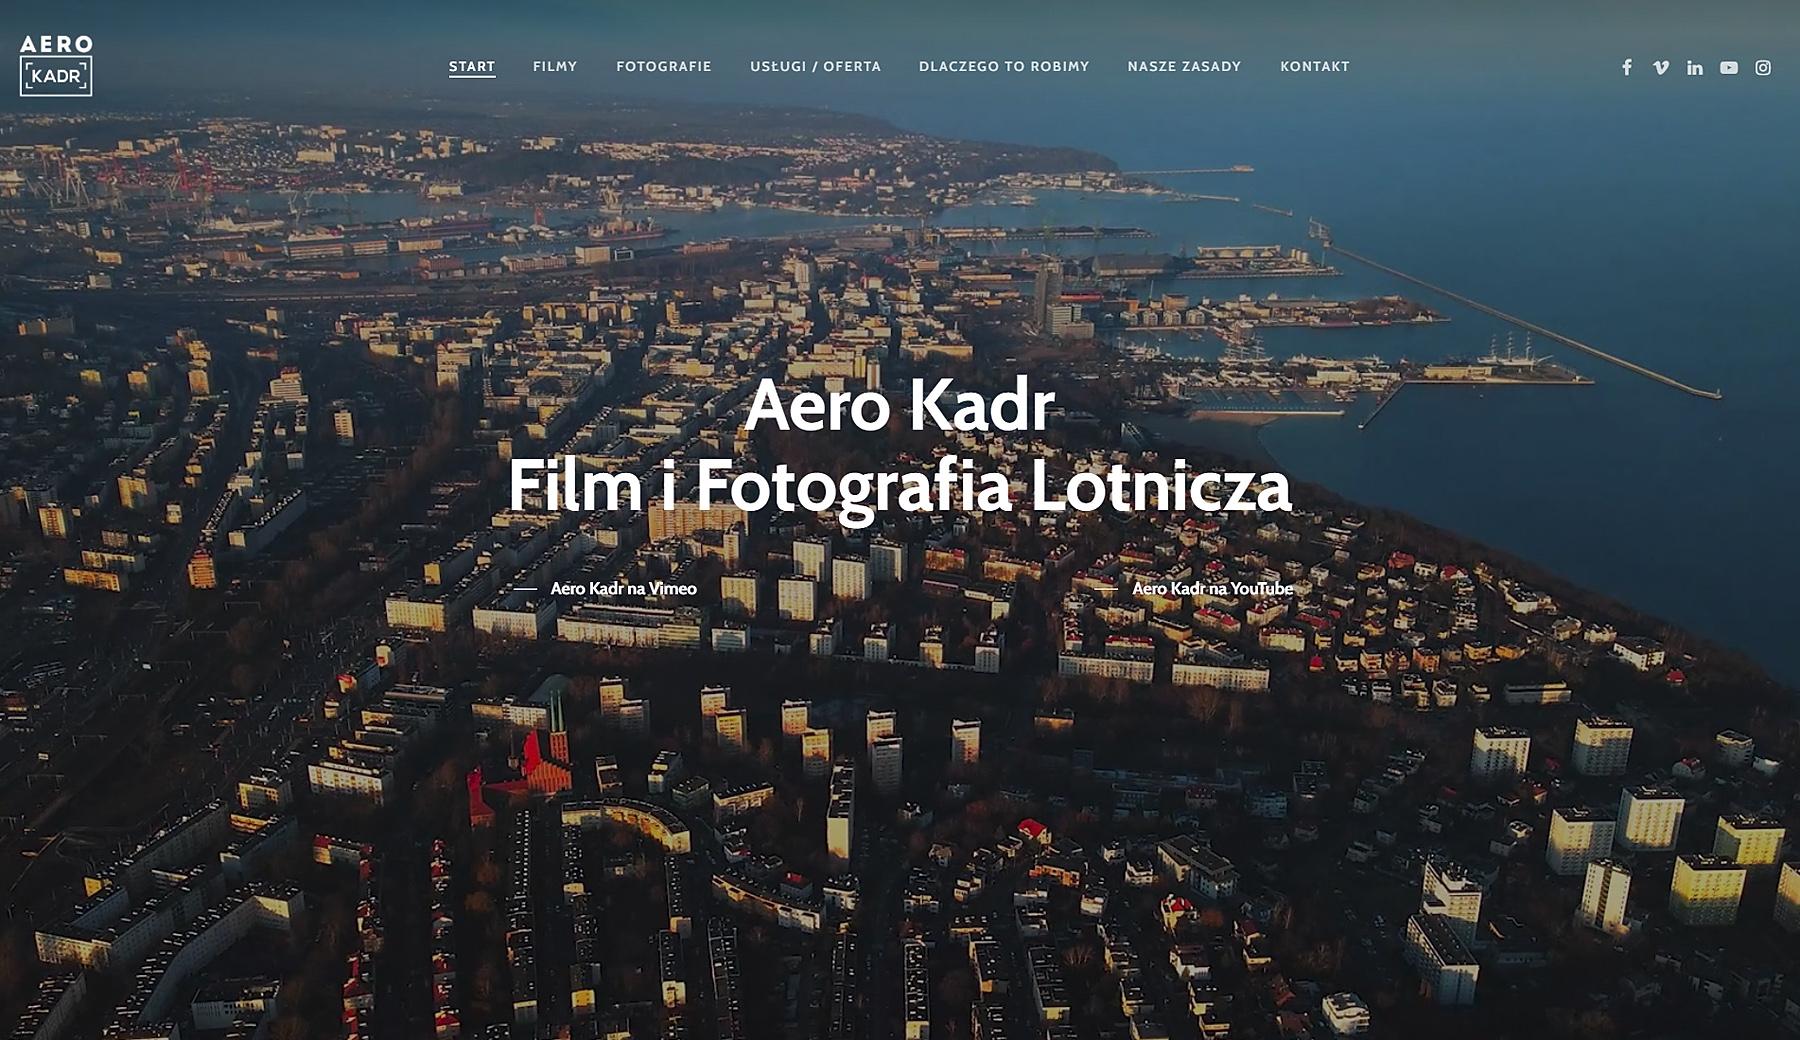 Strona internetowa Aero Kadr